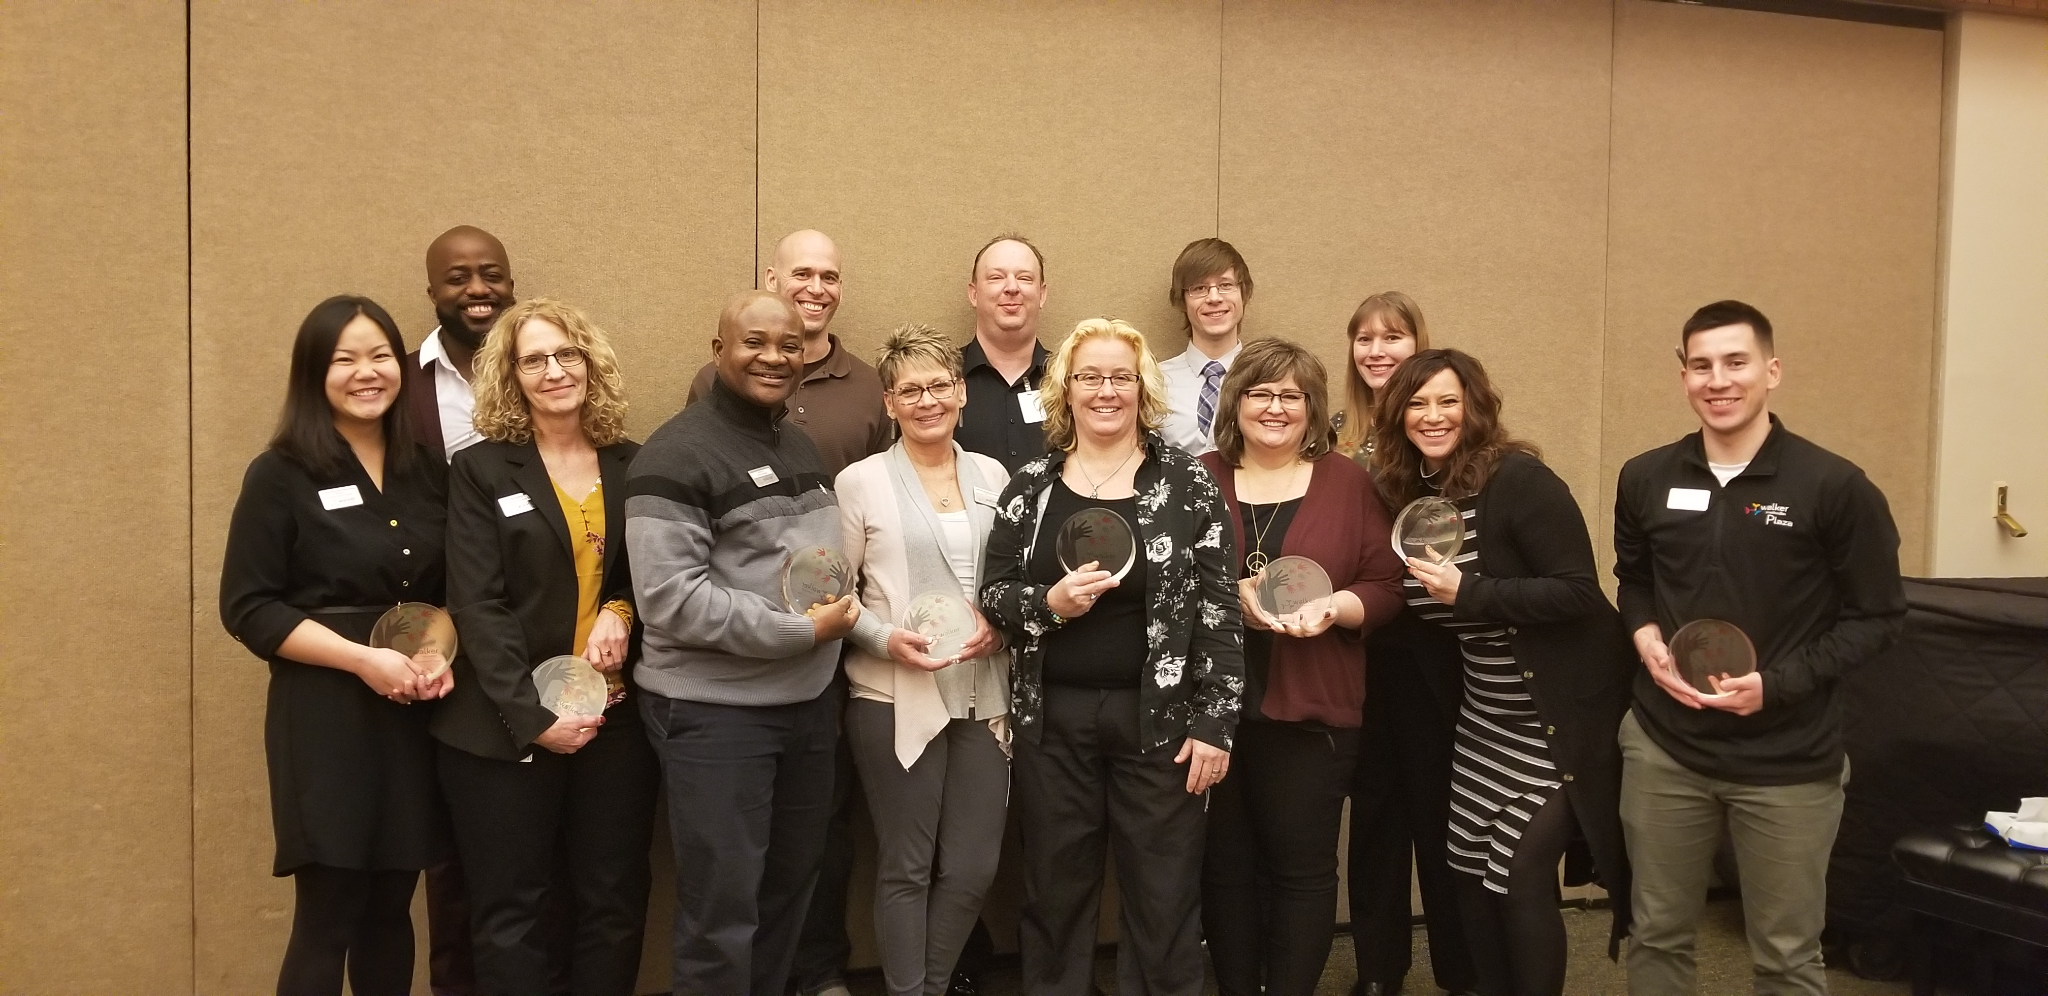 Empowering leaders: Walker Methodist's leadership development program